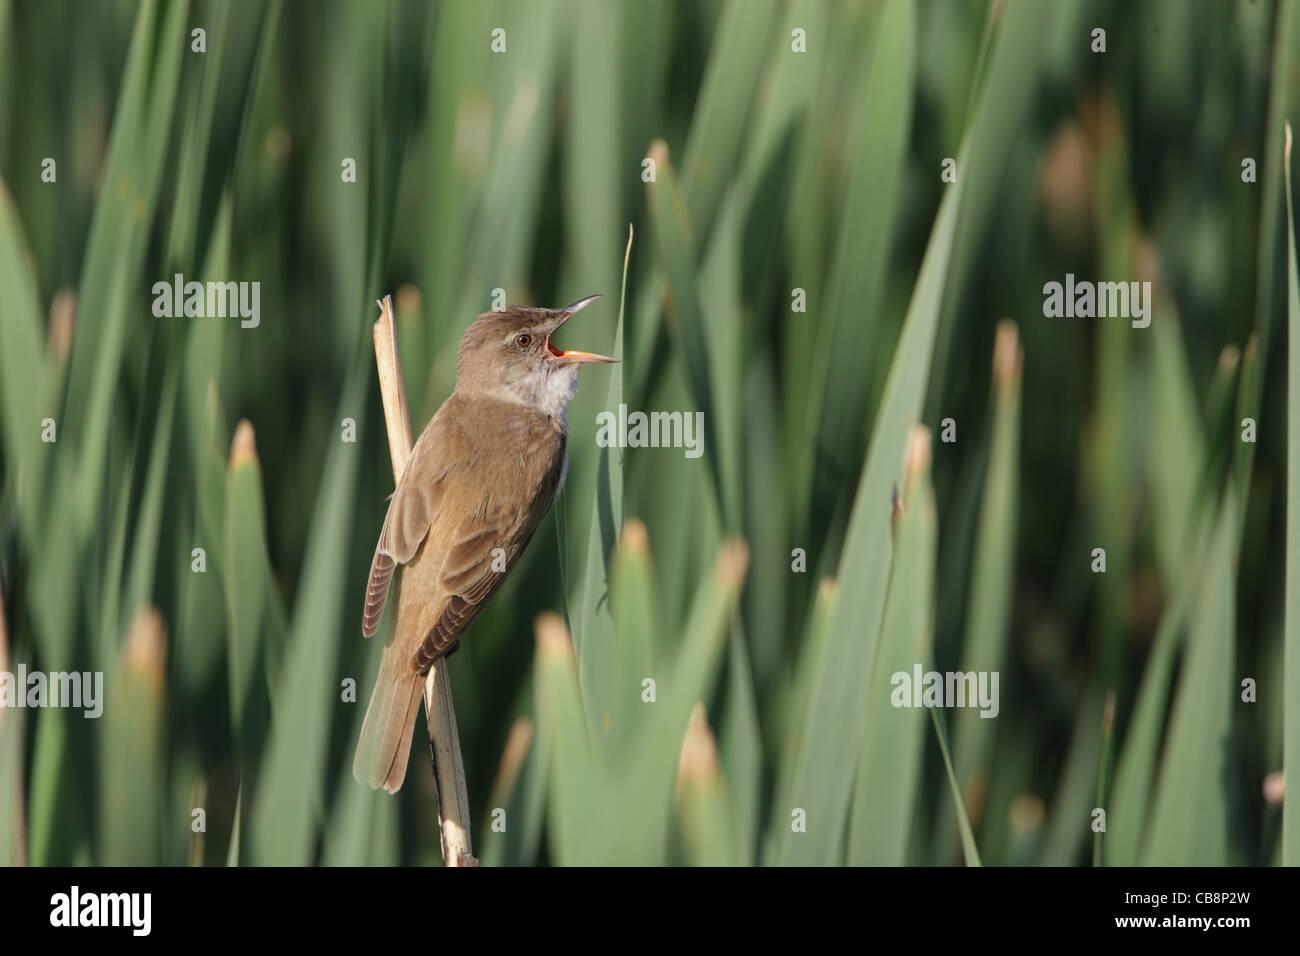 Great Reed Warbler, /Acrocephalus arundinaceus/ Stock Photo